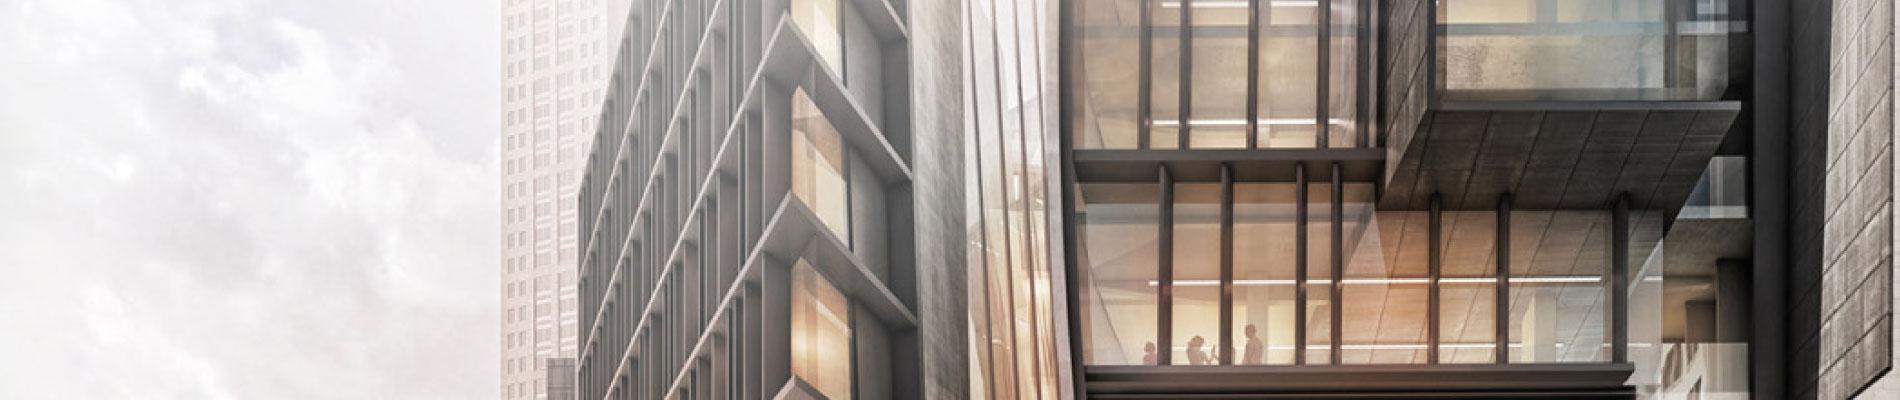 Full |Online Σεμινάριο  Photoshop CC 2018 - Architecture